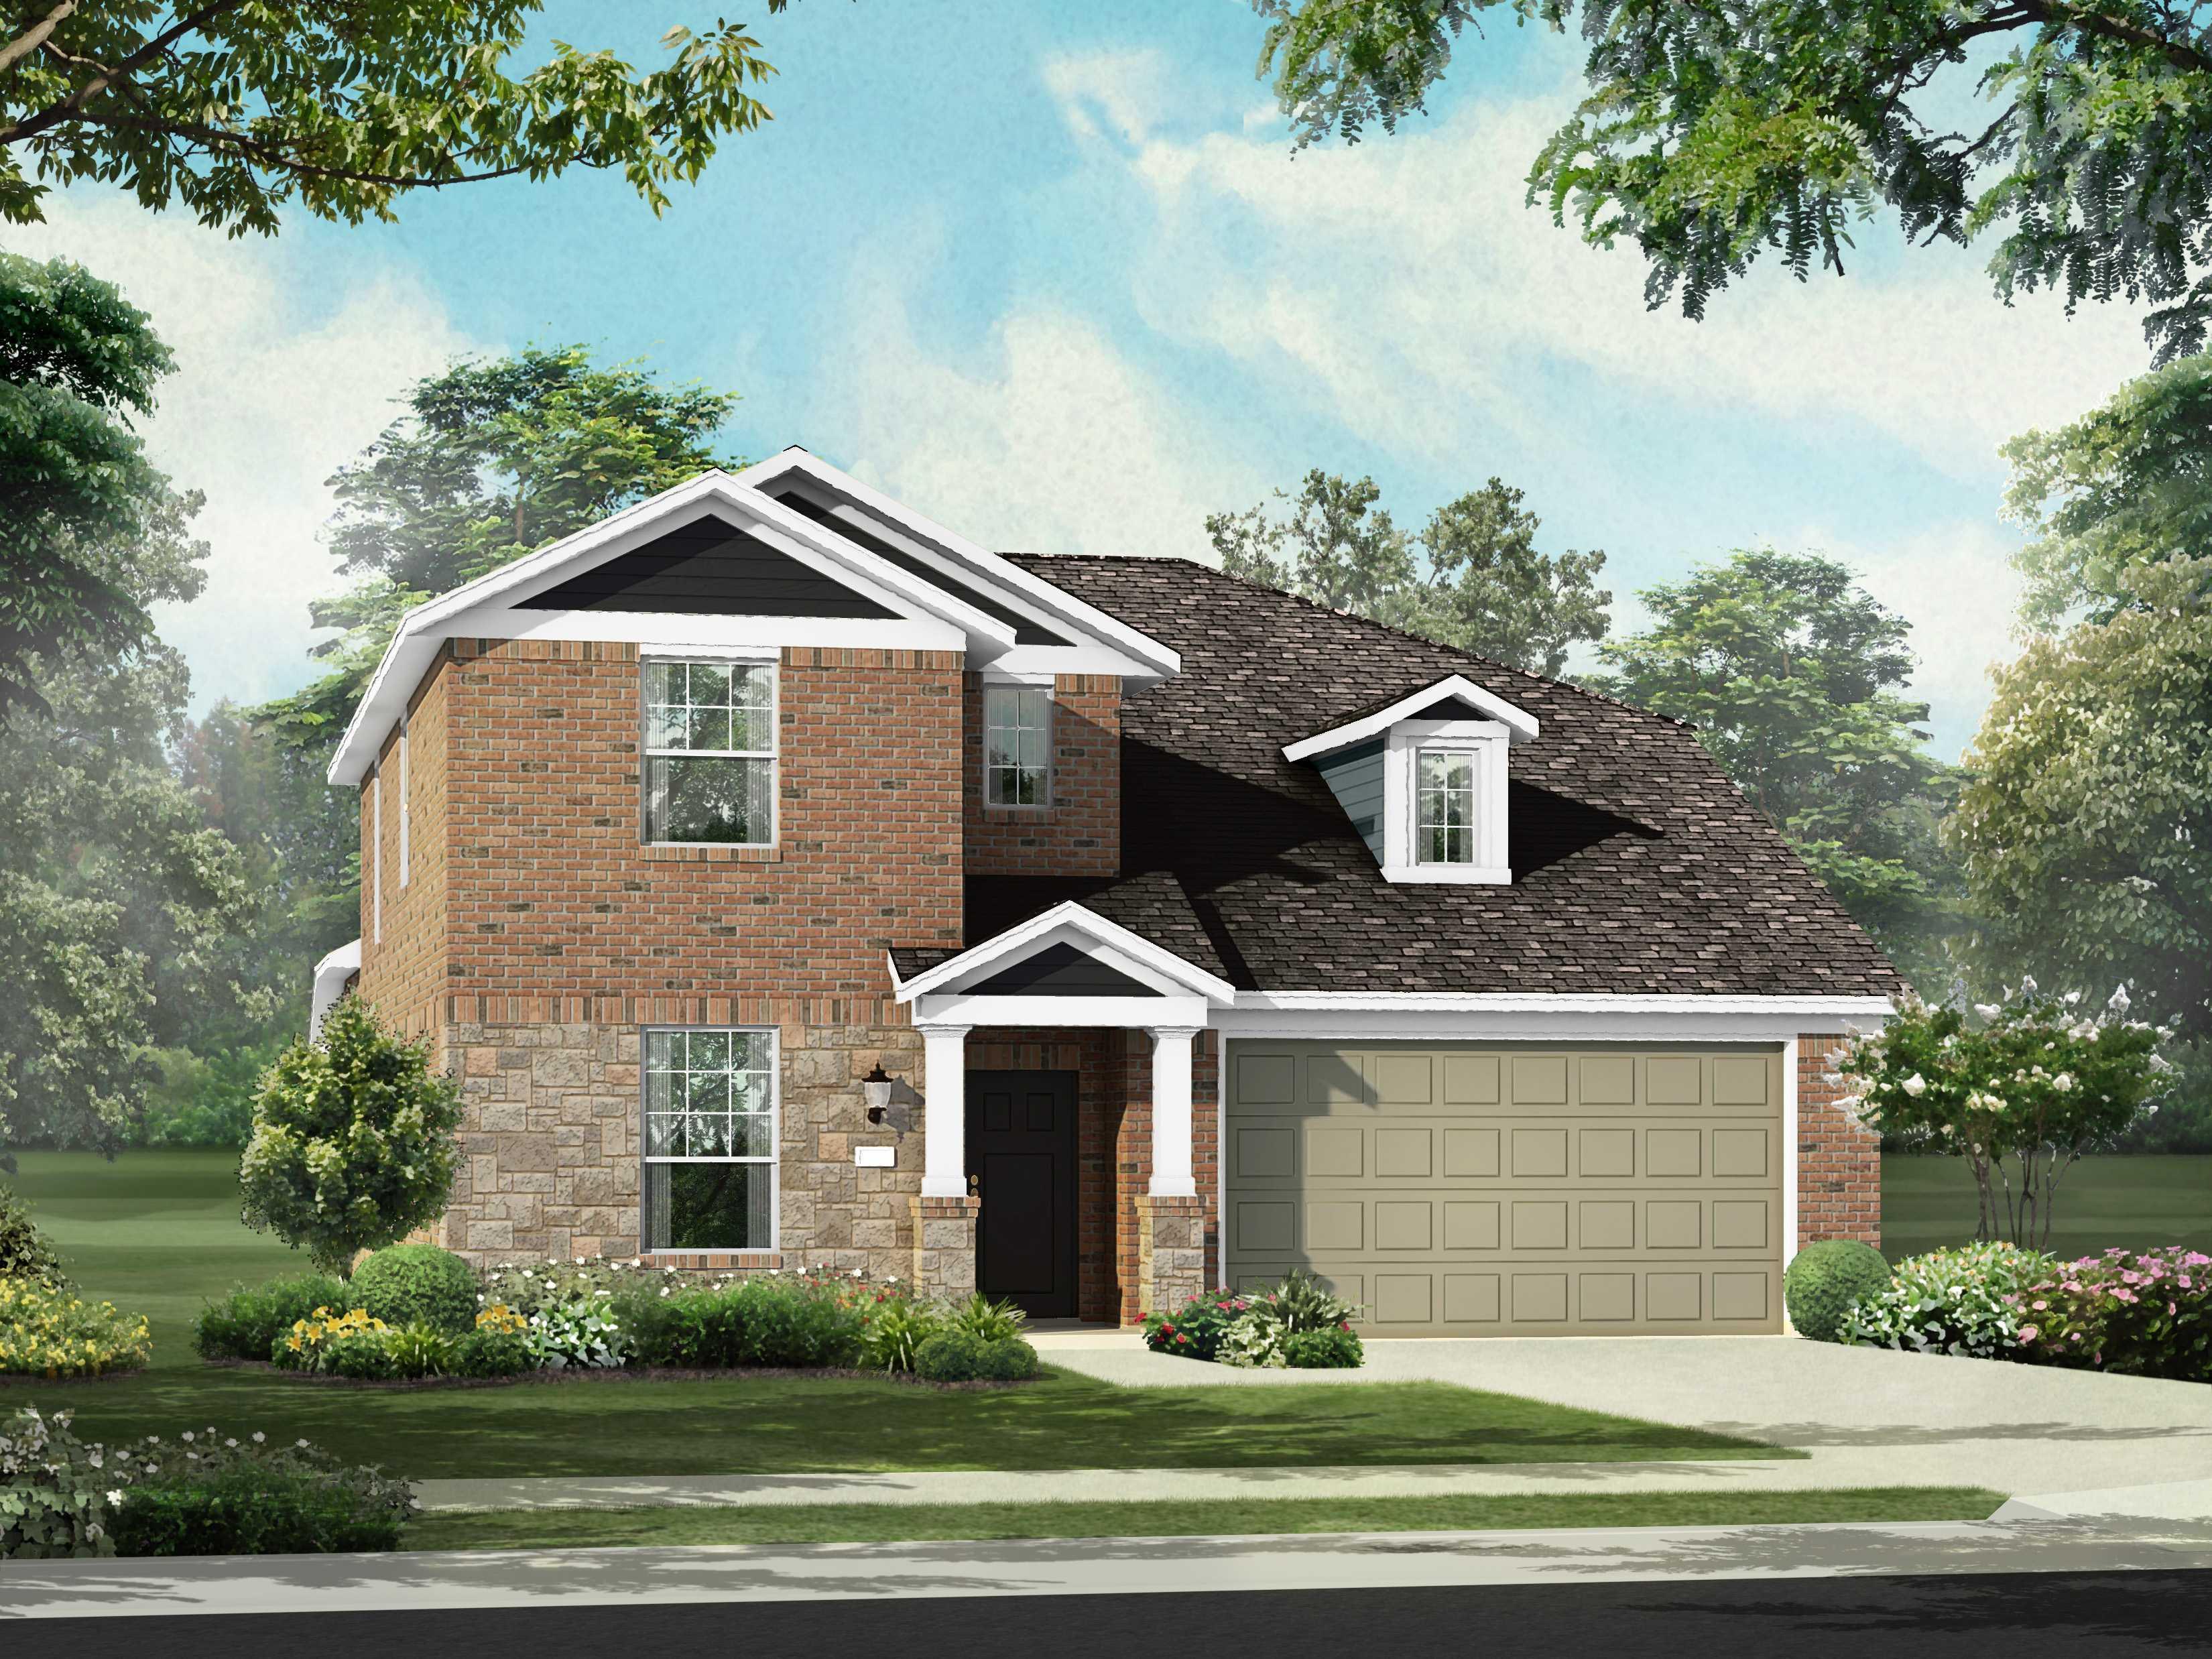 horizon homes houston tx communities u0026 homes for sale newhomesource